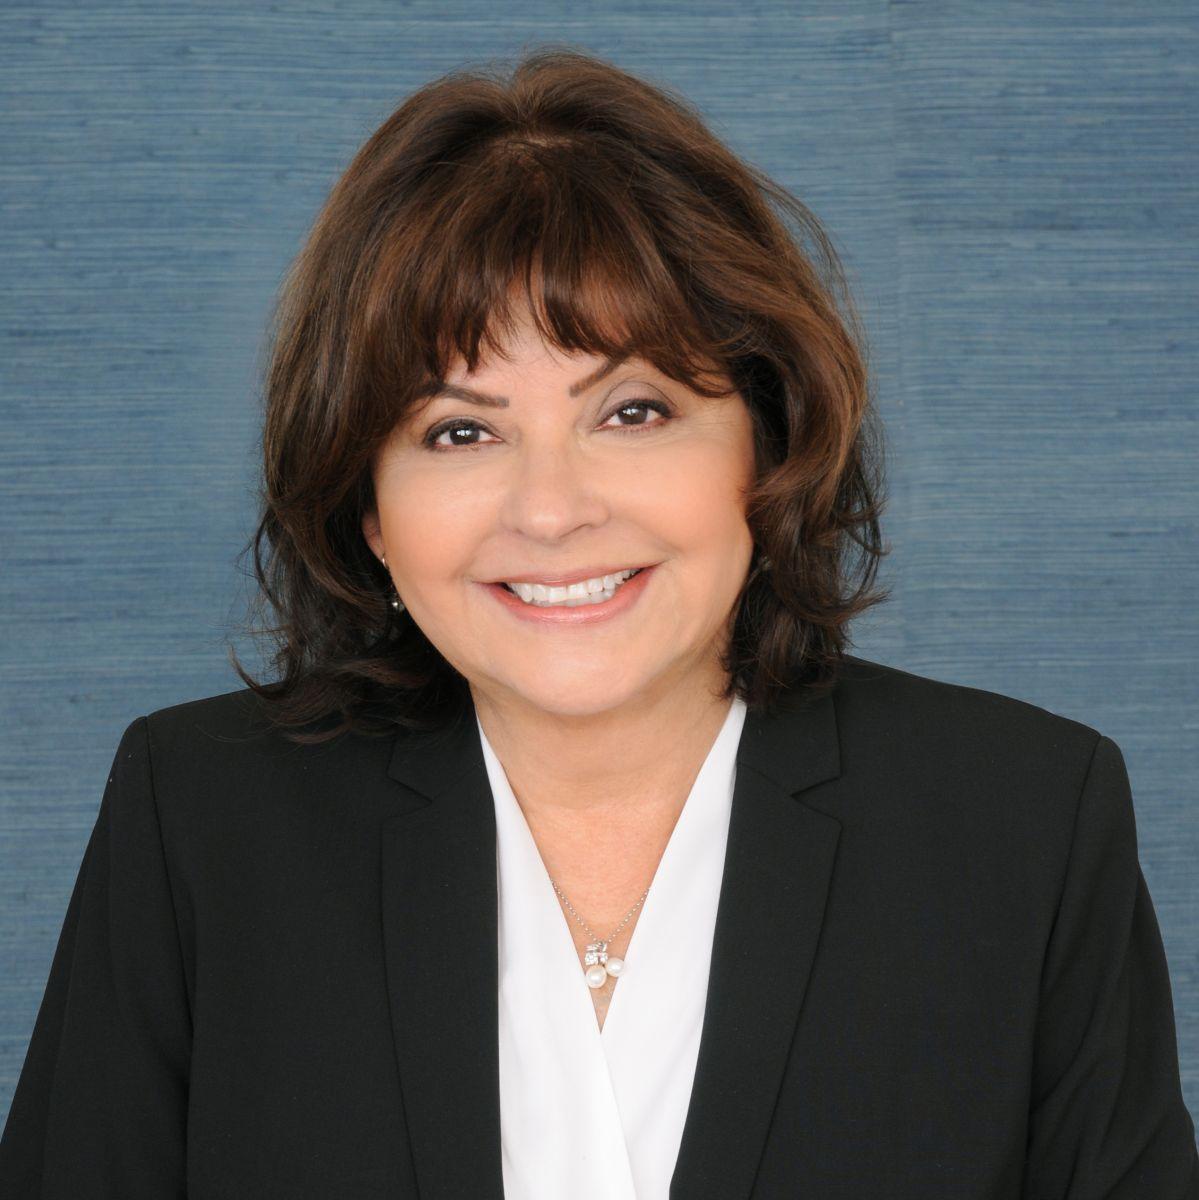 Marlene Zepeda